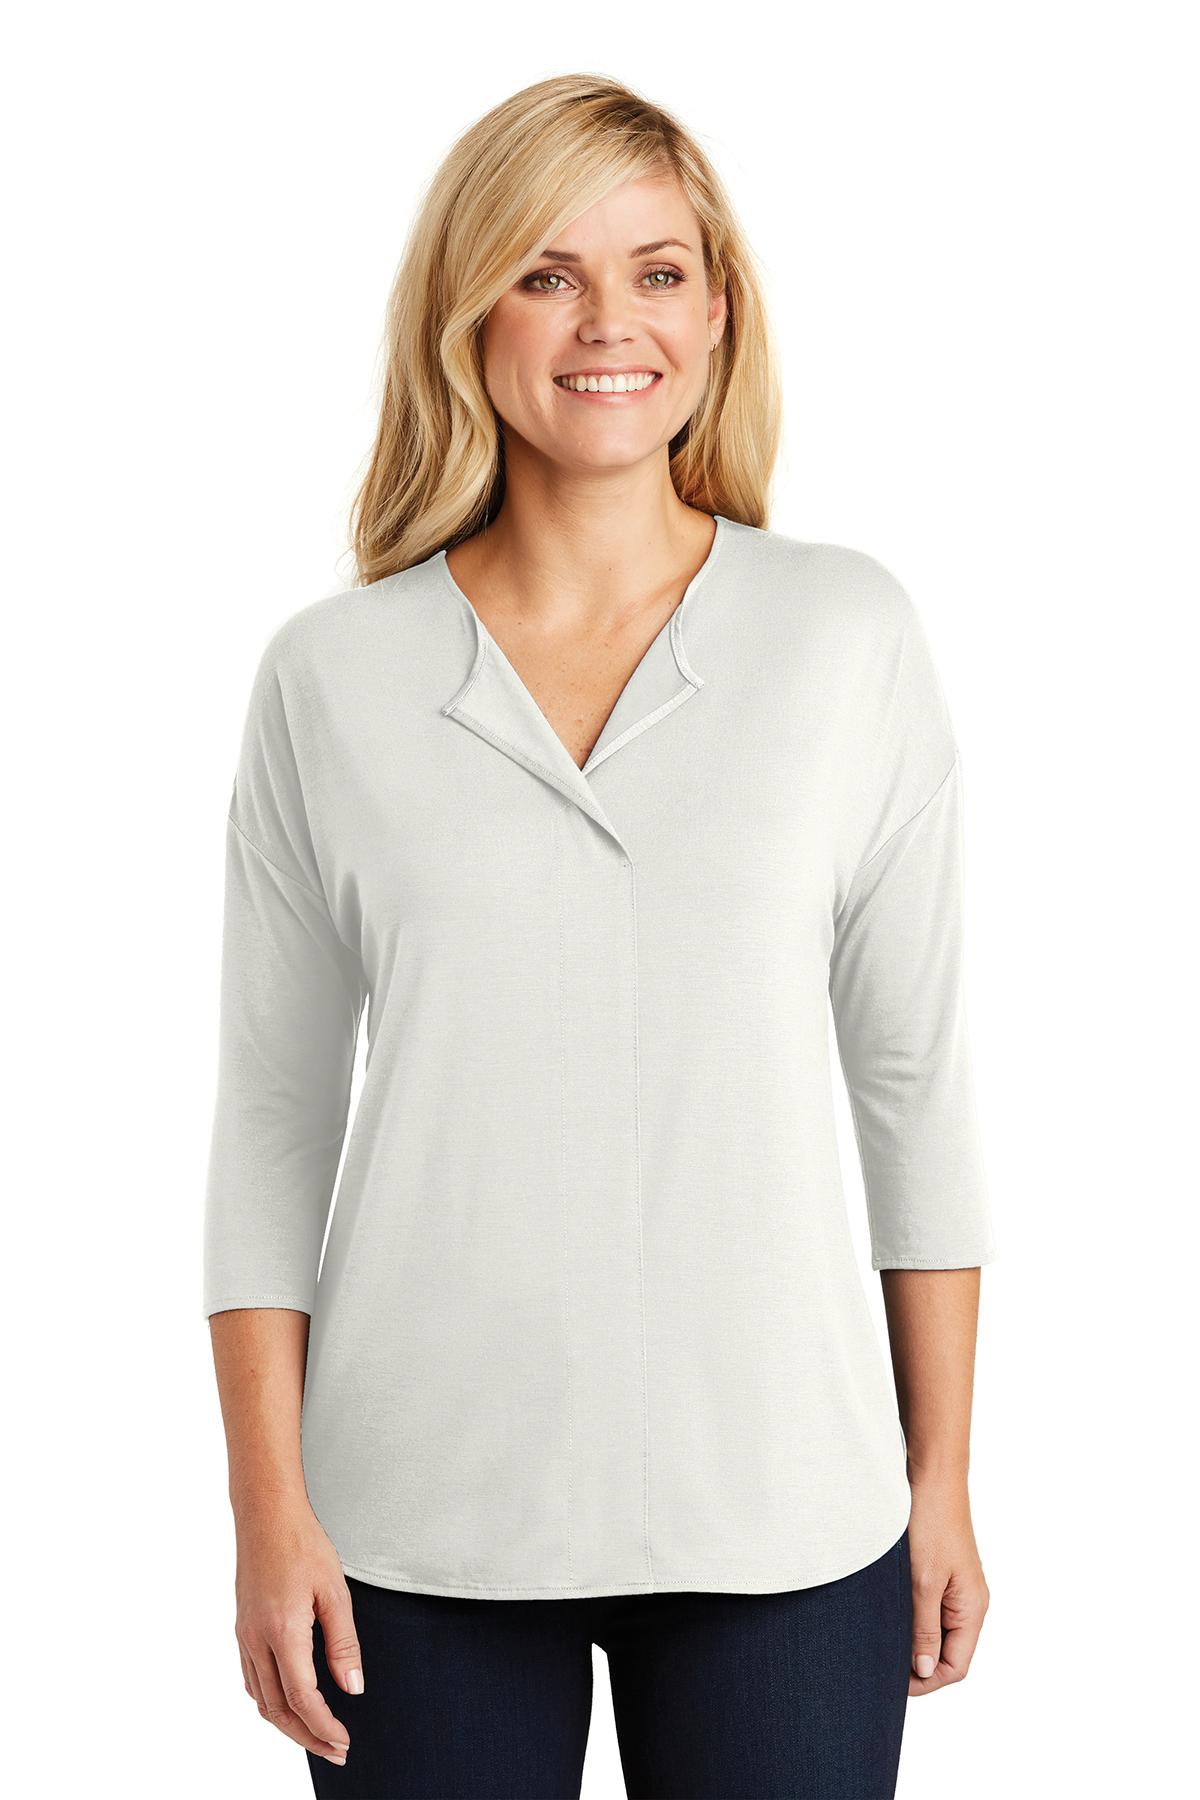 Port Authority LK5433 - Ladies Concept 3/4-Sleeve Soft Split Neck Top